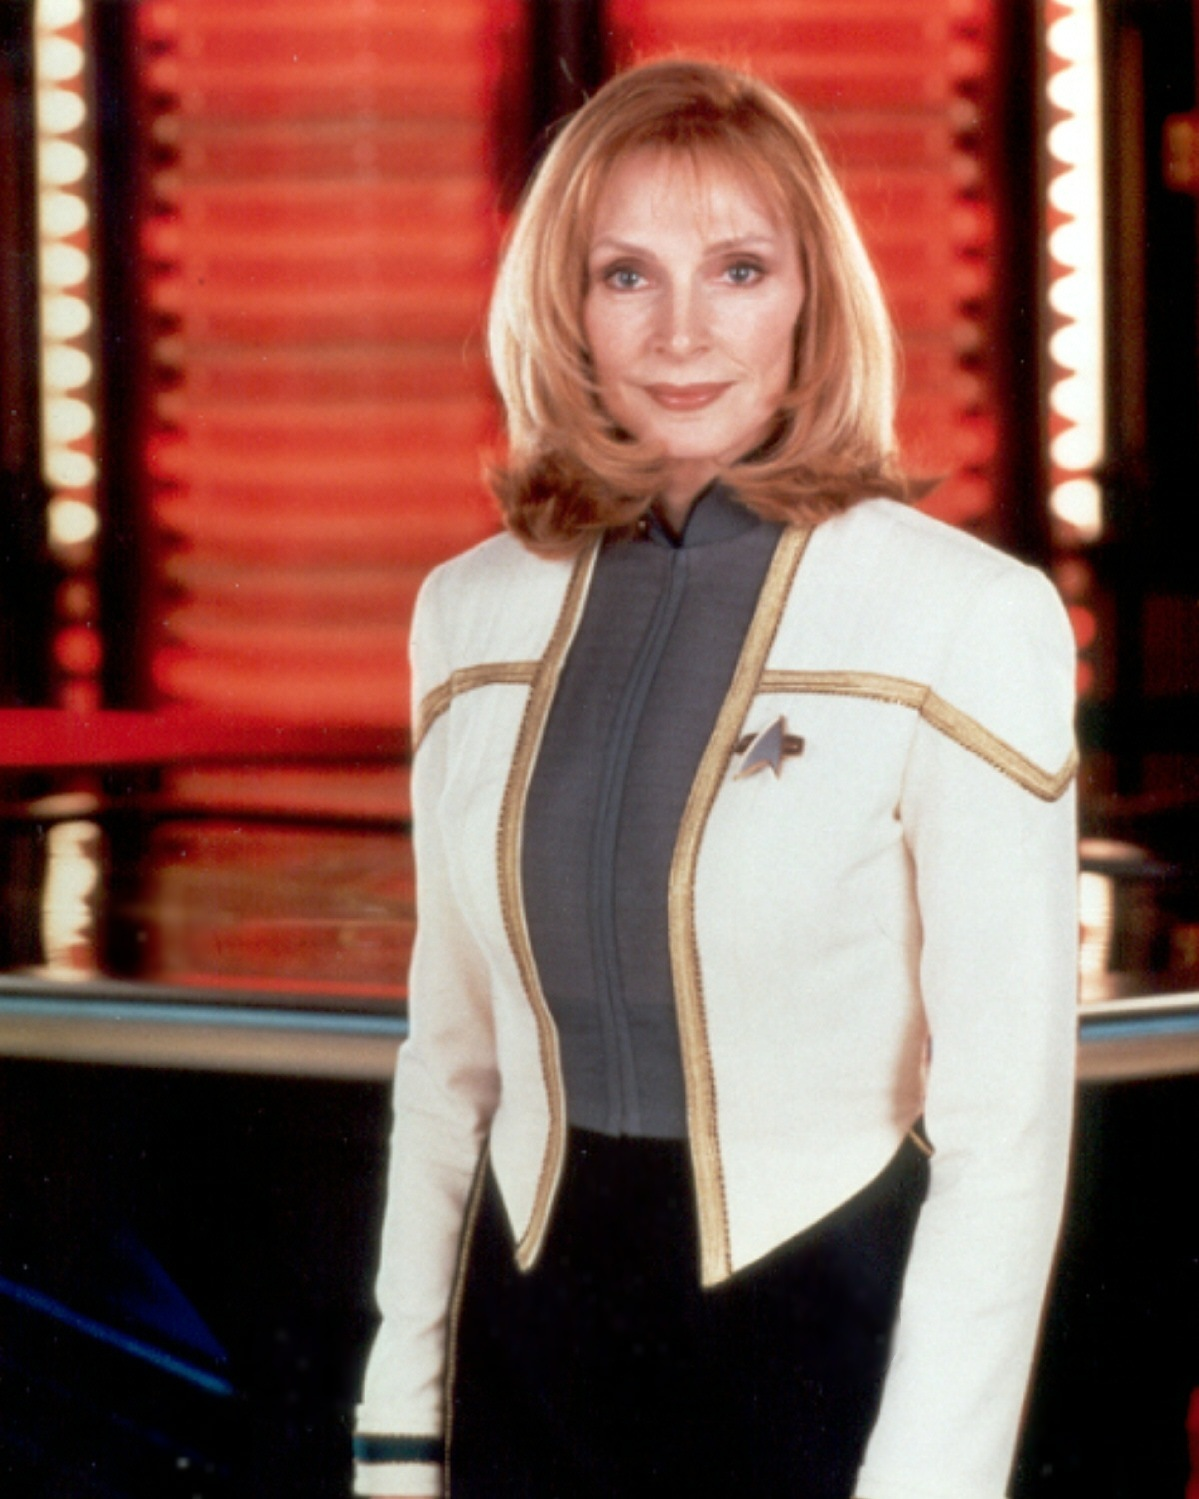 Doctor Beverly Crusher